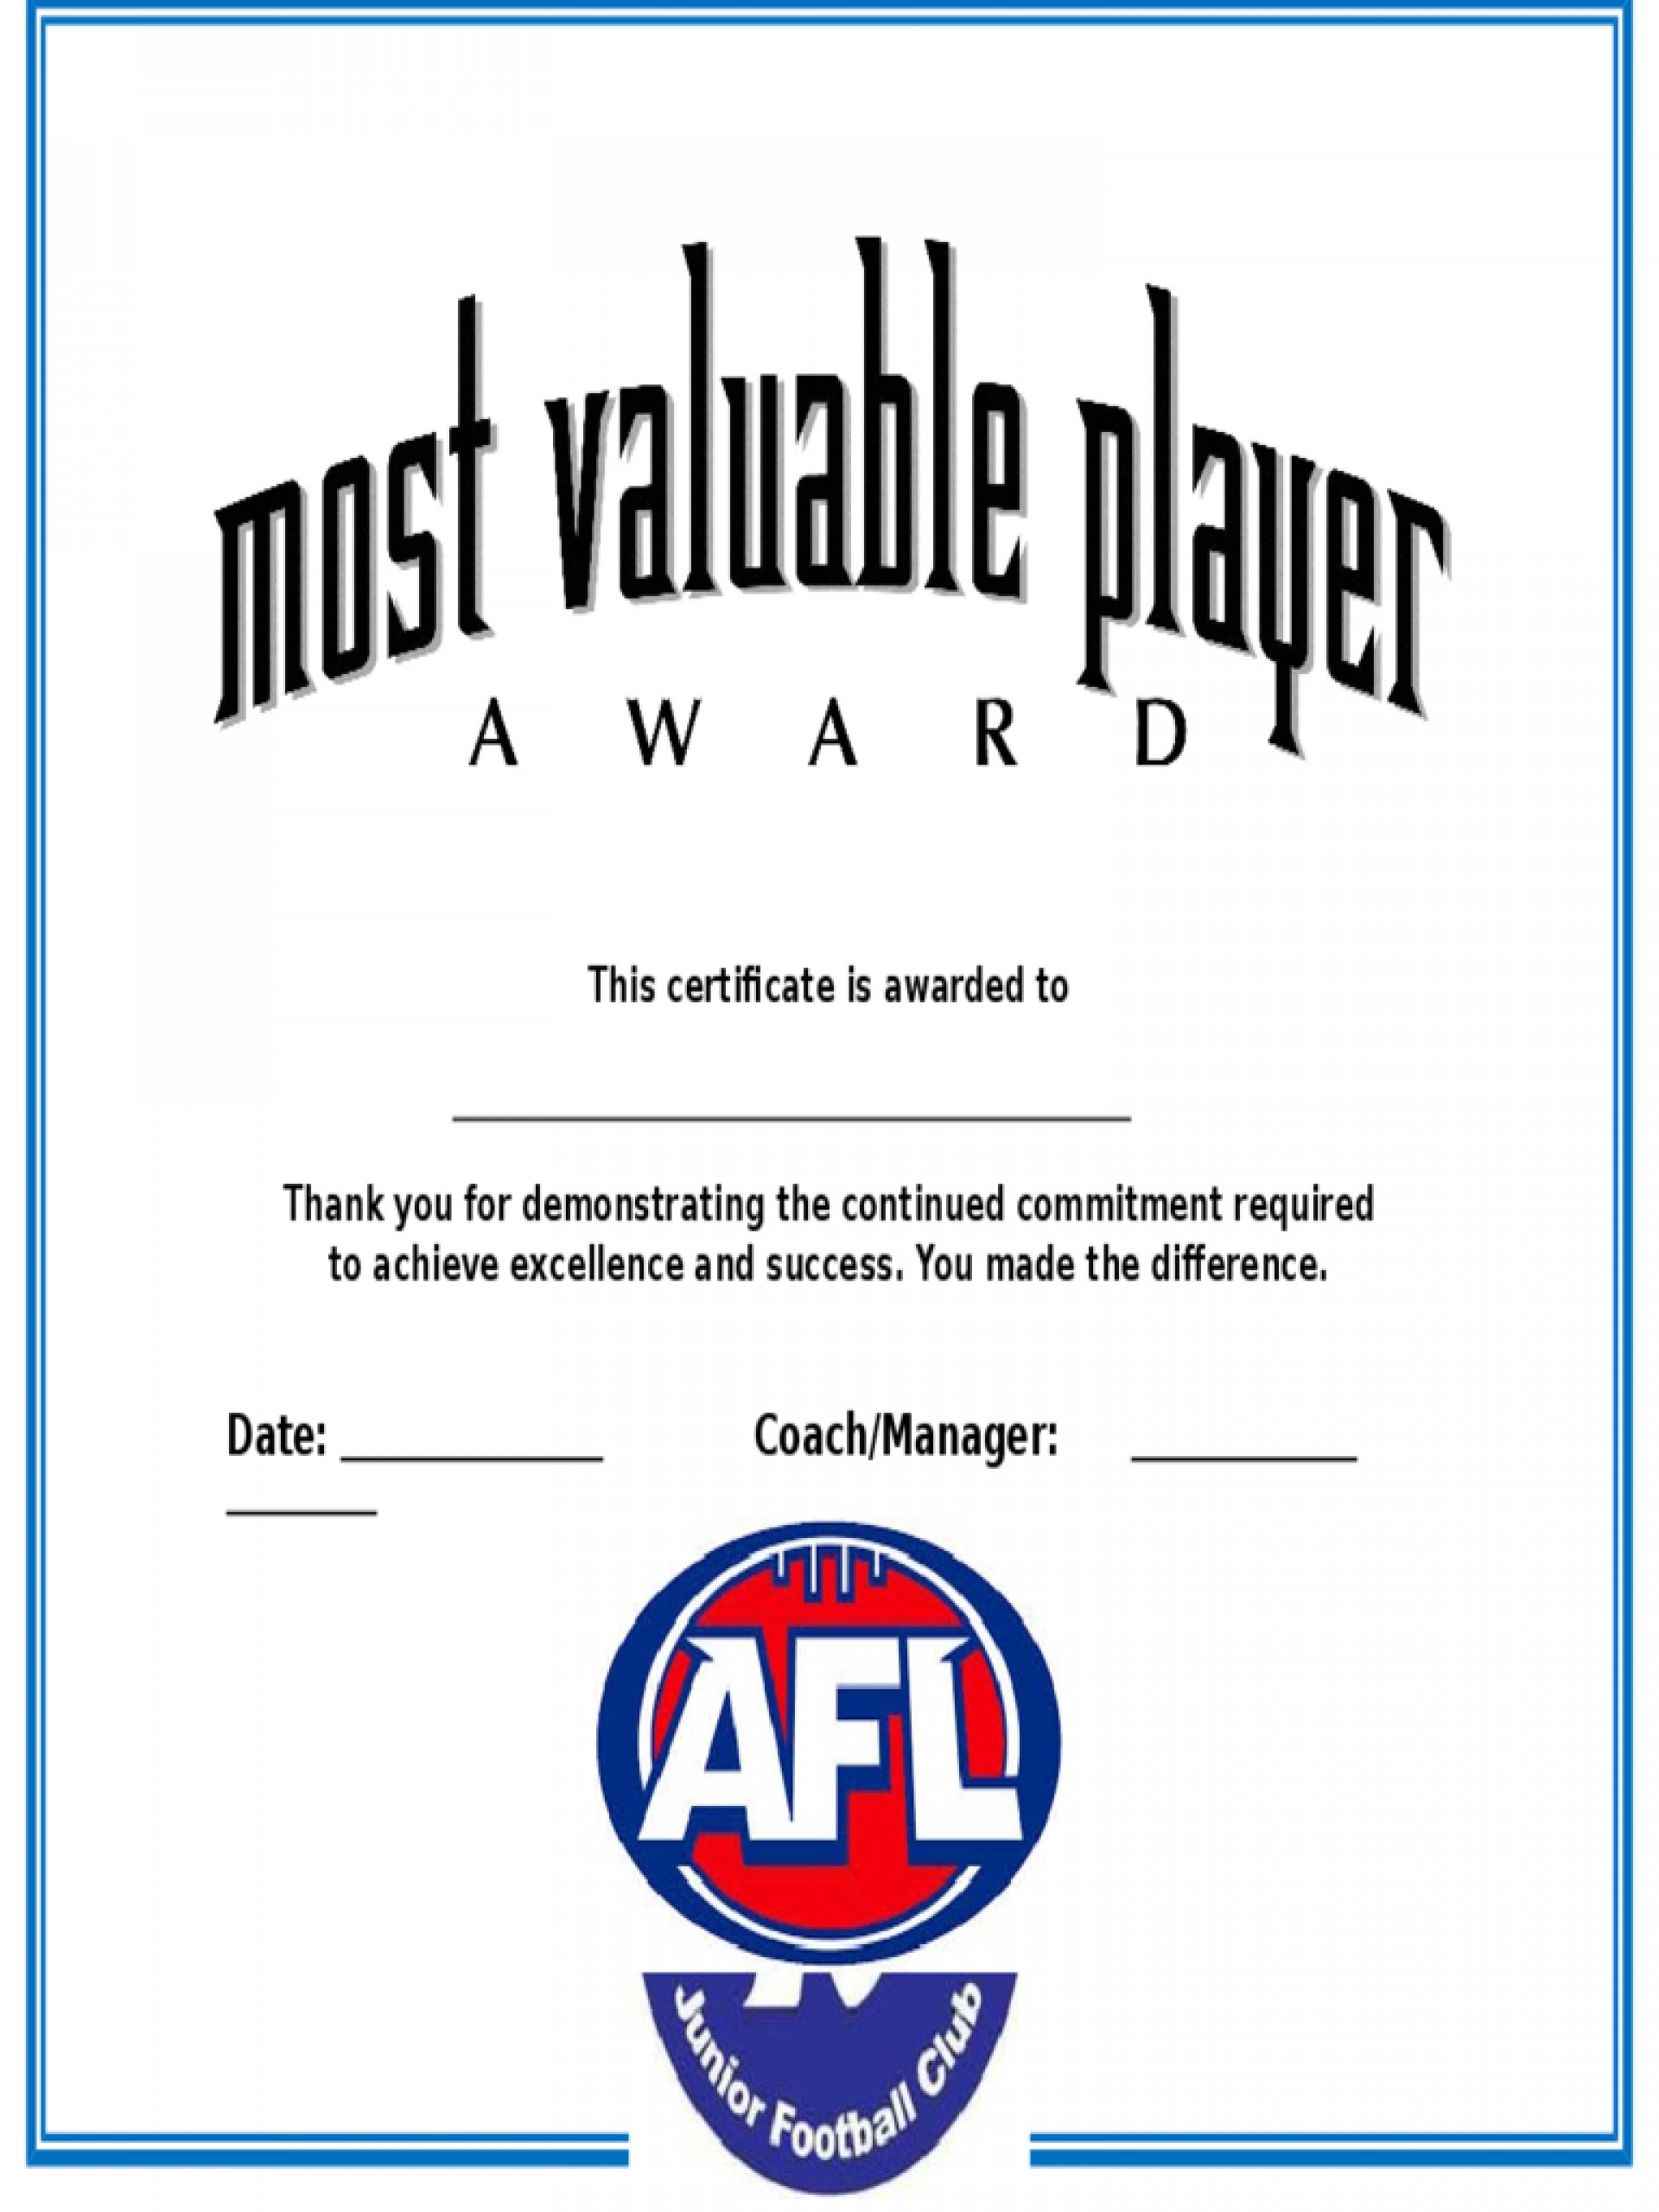 008 Sports Award Certificate Template Word Impressive Ideas Intended For Sports Award Certificate Template Word